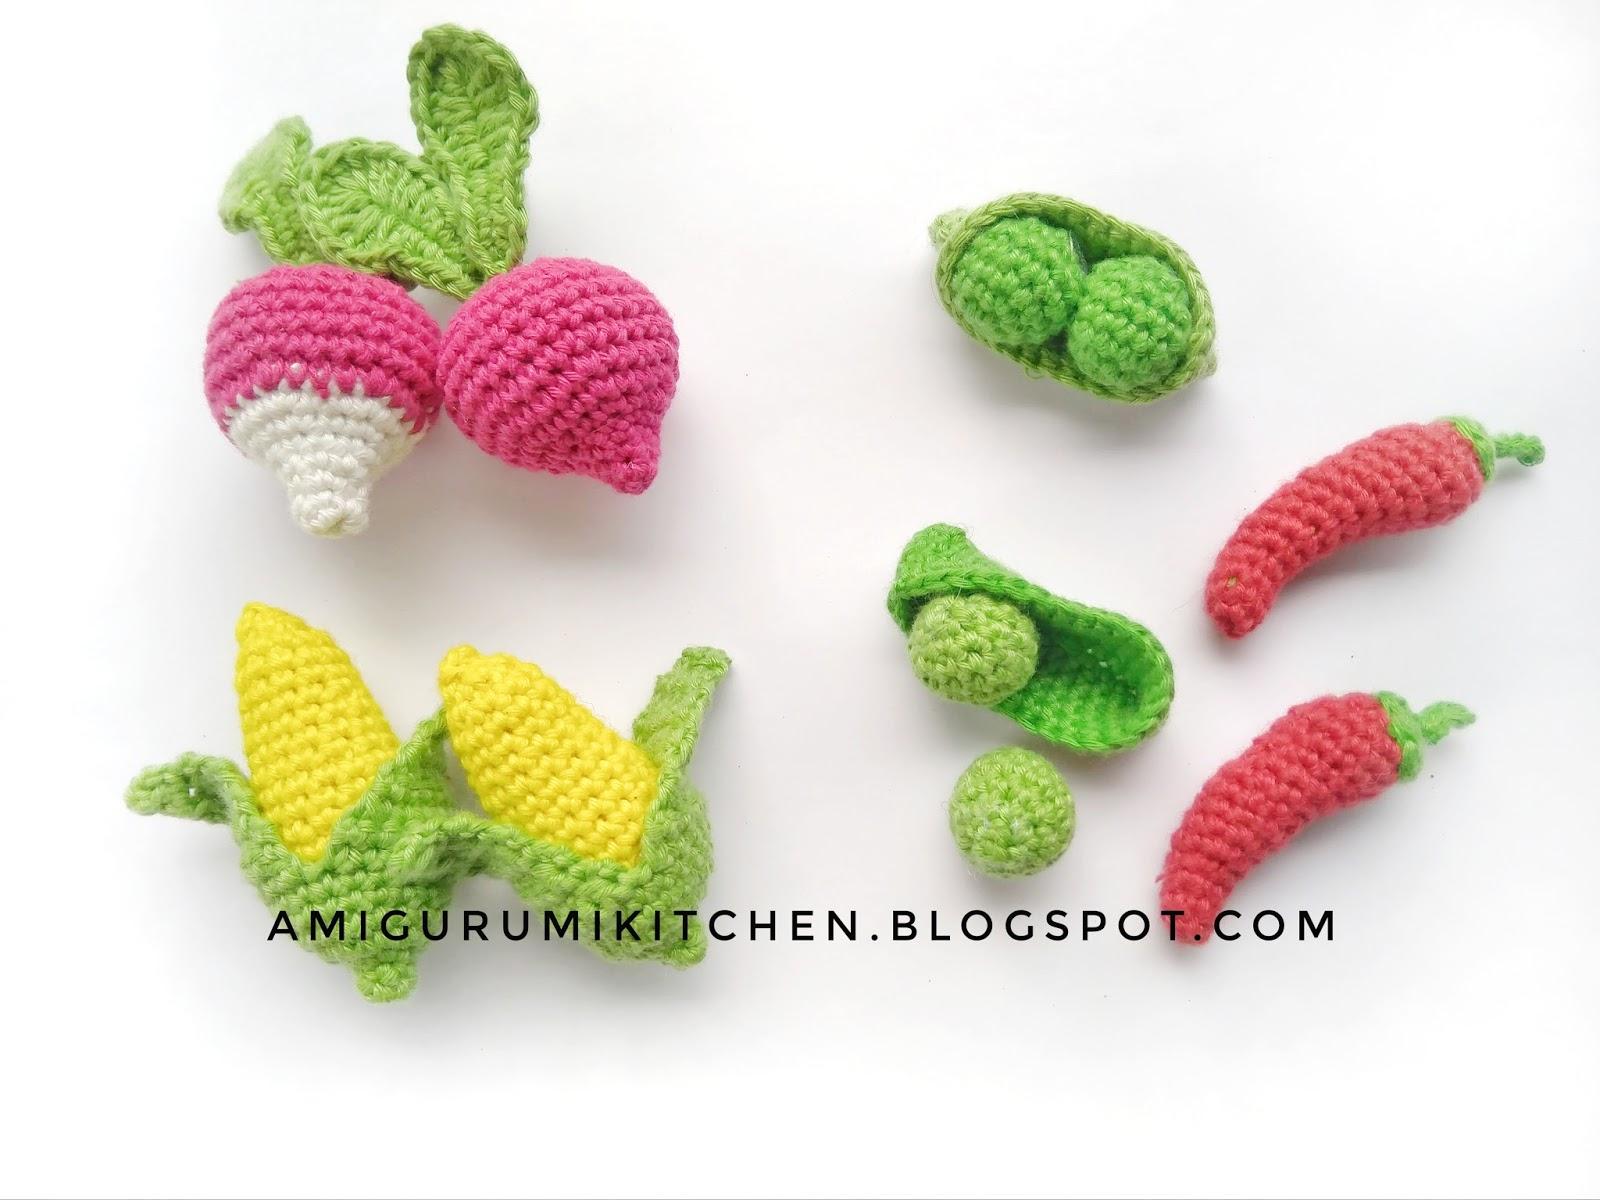 Amigurumi Vegetables : Little vegetables amigurumi kitchen